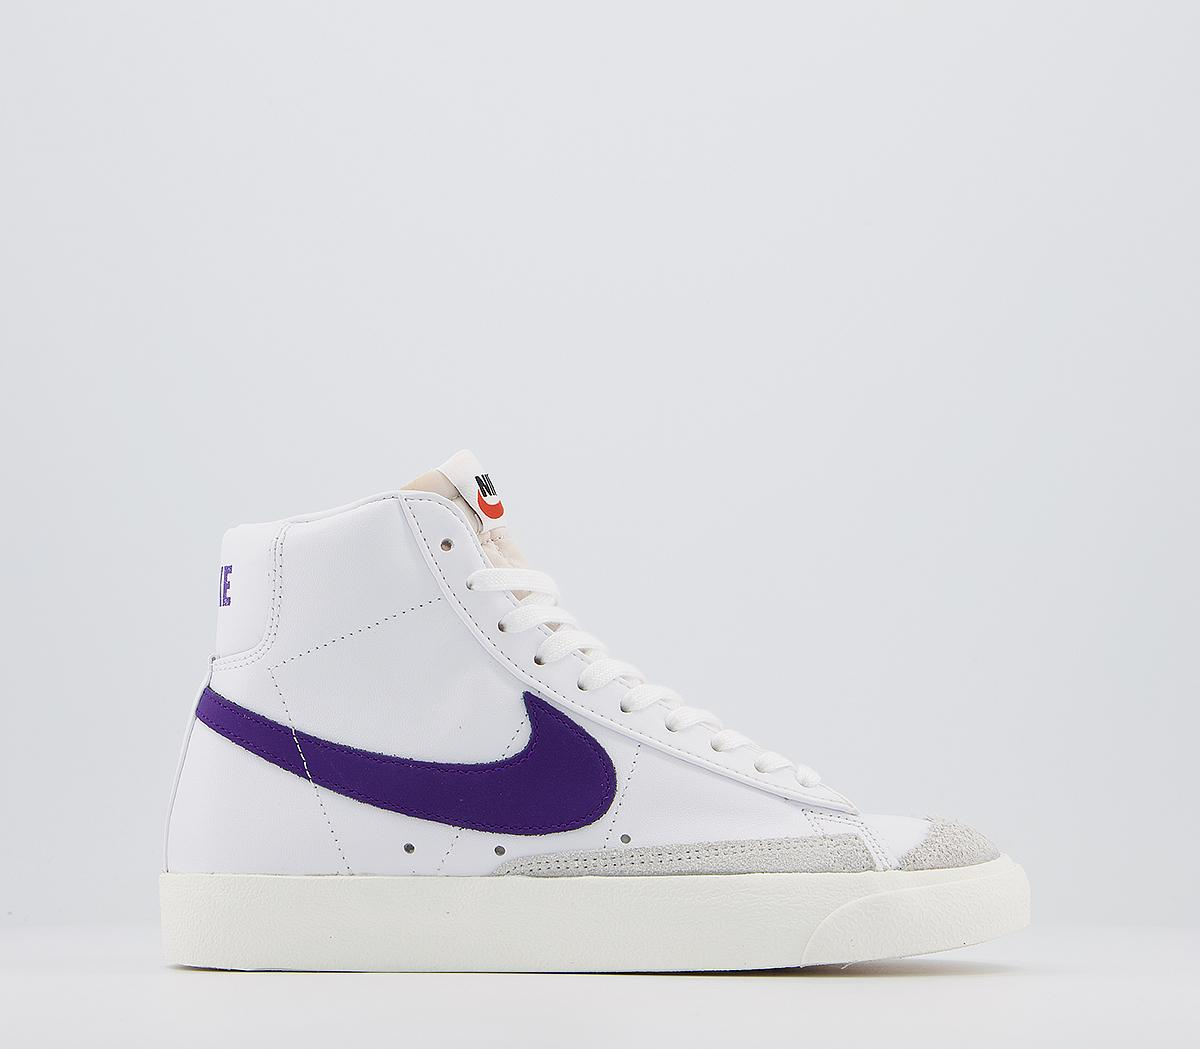 Nike Blazer Mid 77 白紫拼色運動鞋,現特價£89.99(約794元)